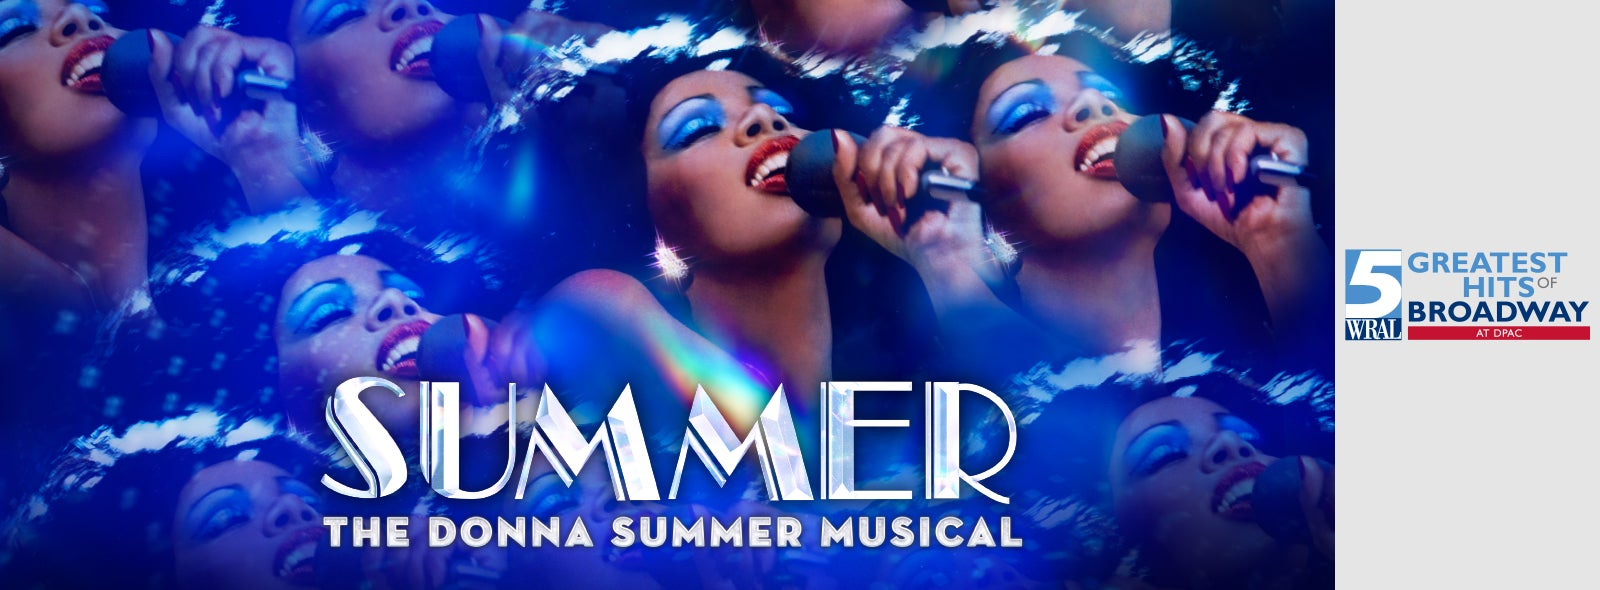 Donna Summer Musical More Info_1600x590